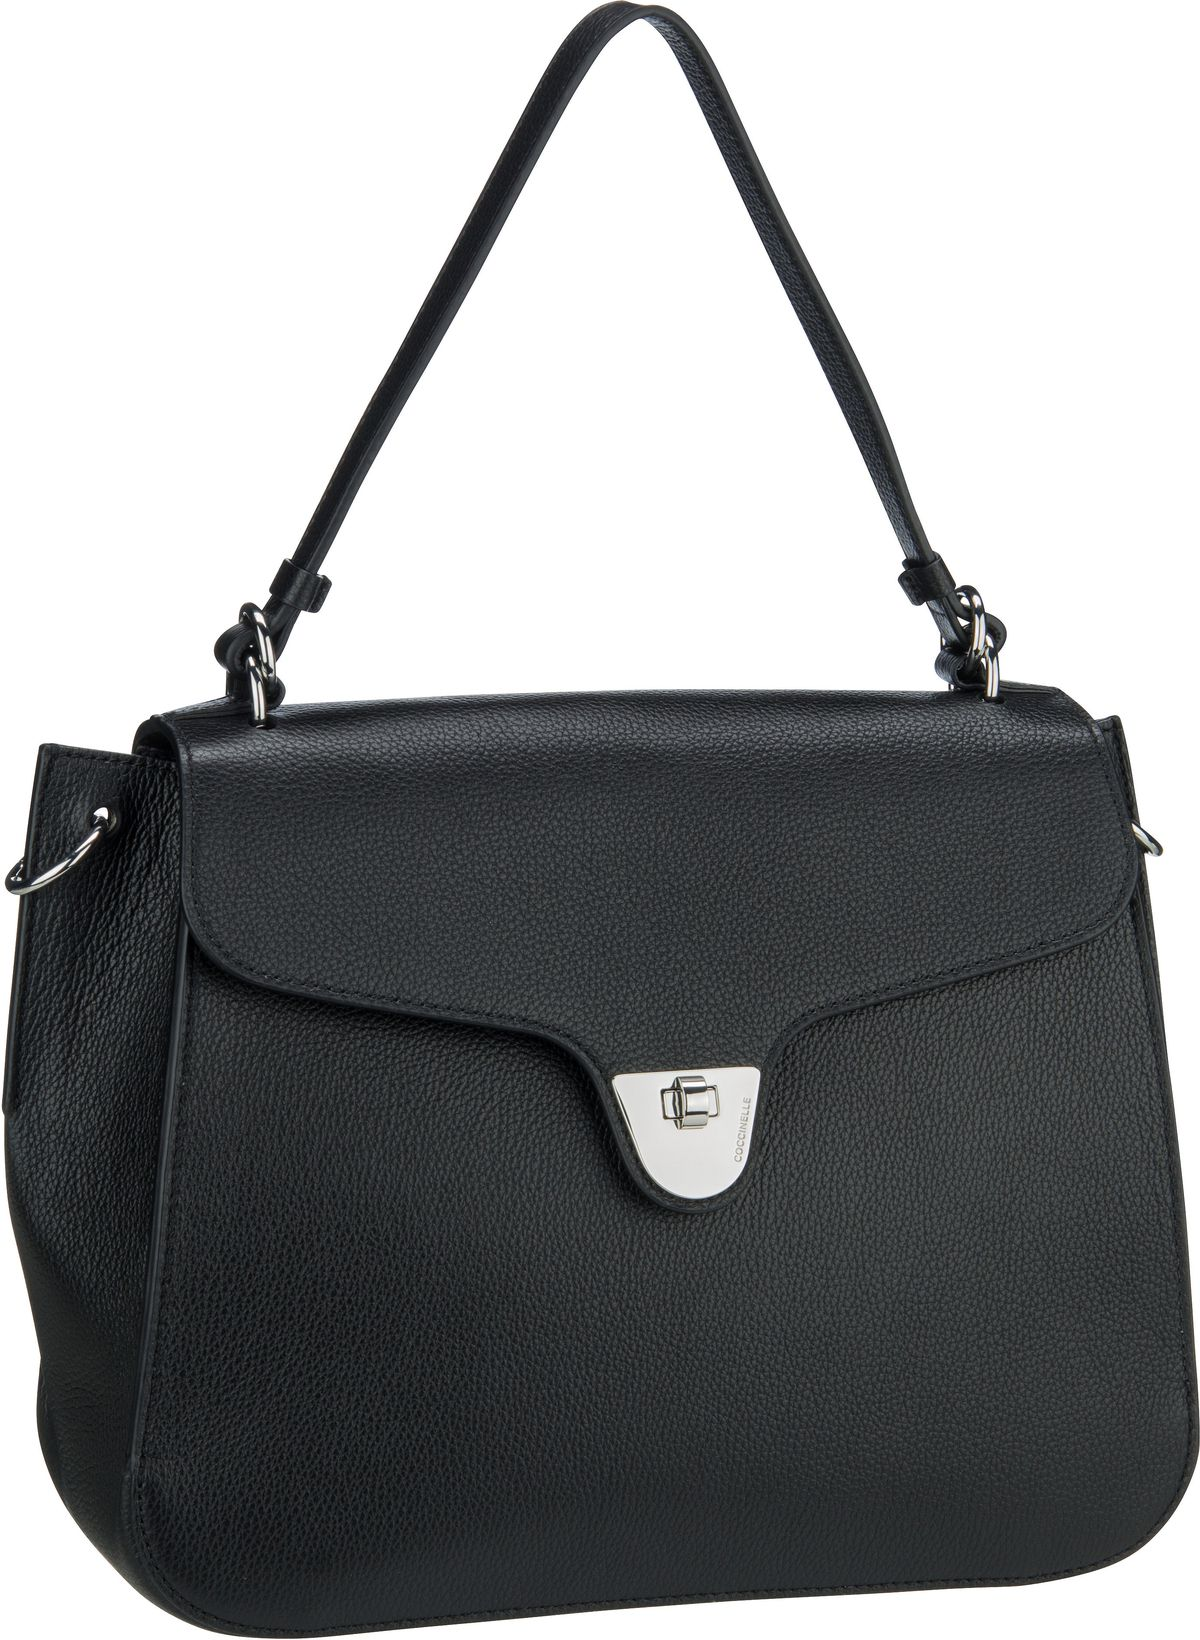 Handtasche Florence 1201 Nero